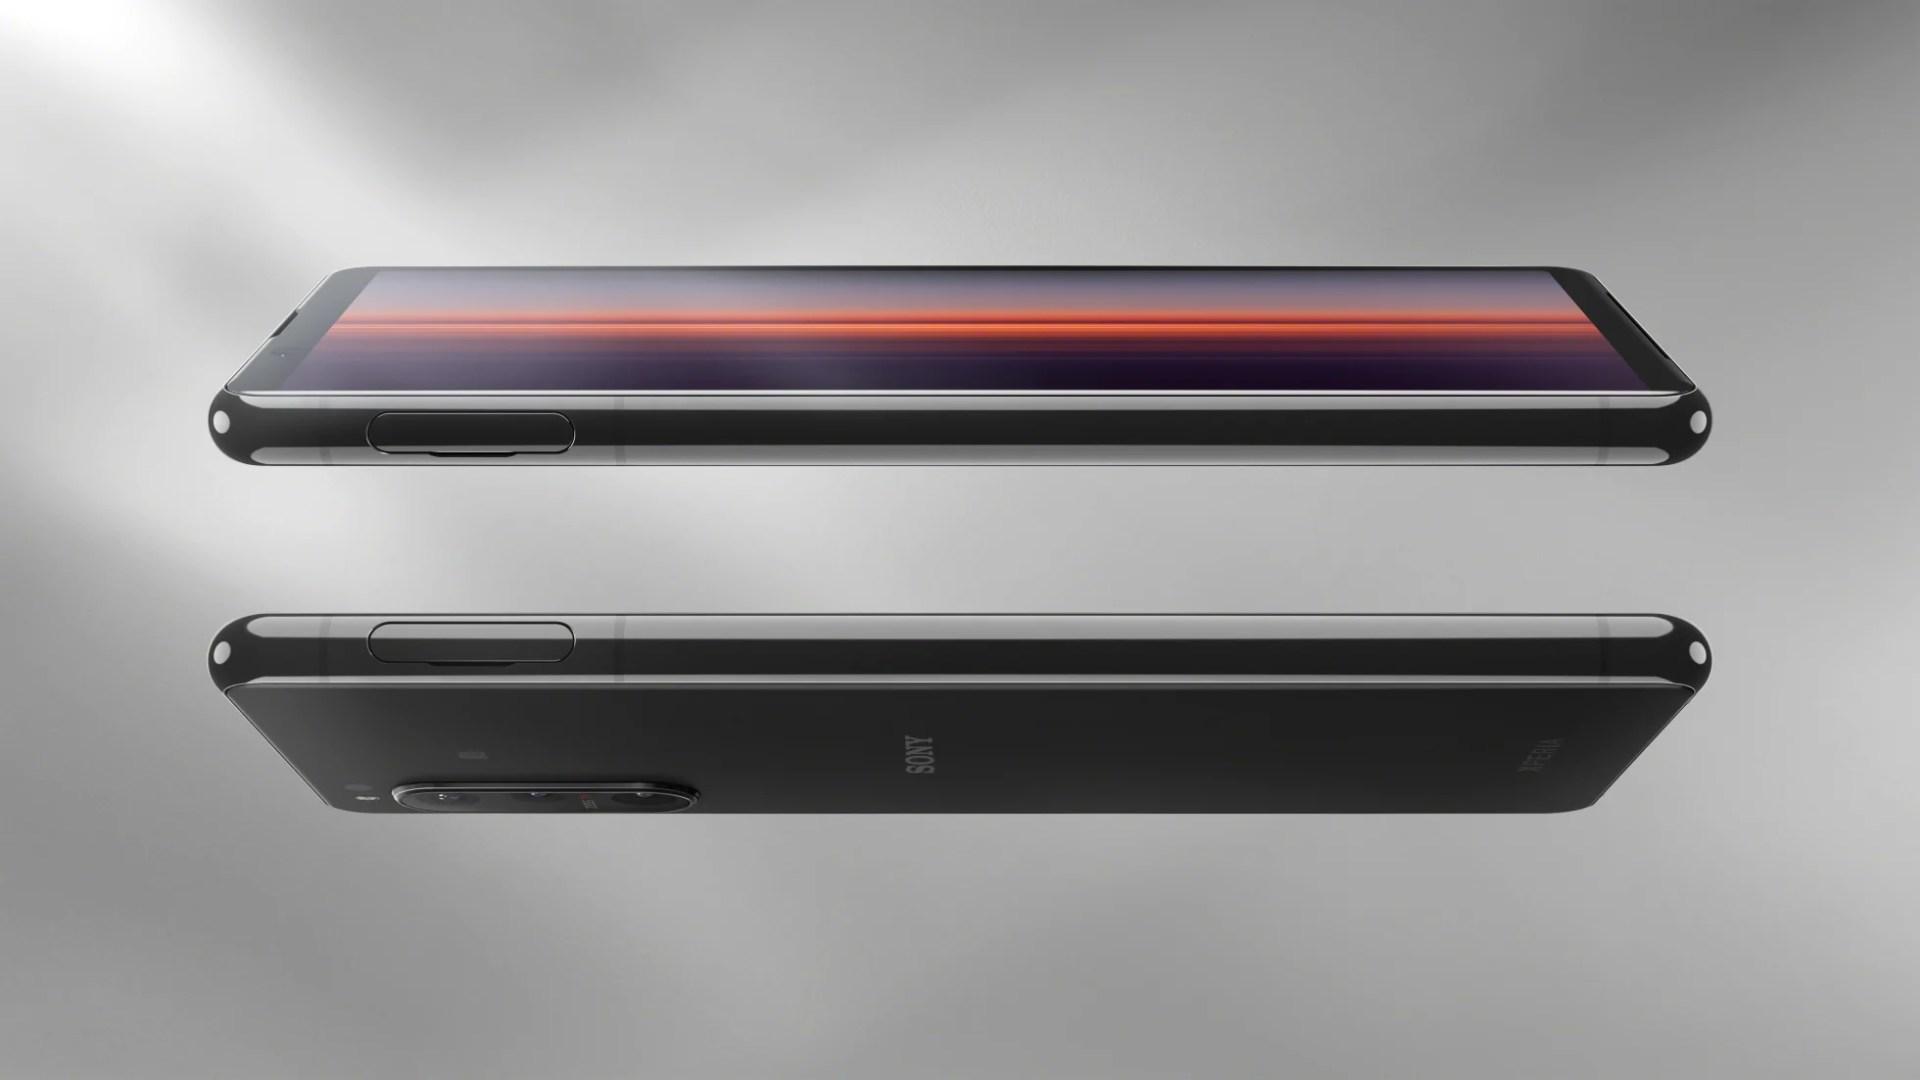 Smartphone, Sony, Xperia, Sony Smartphone, Sony Xperia 5 II